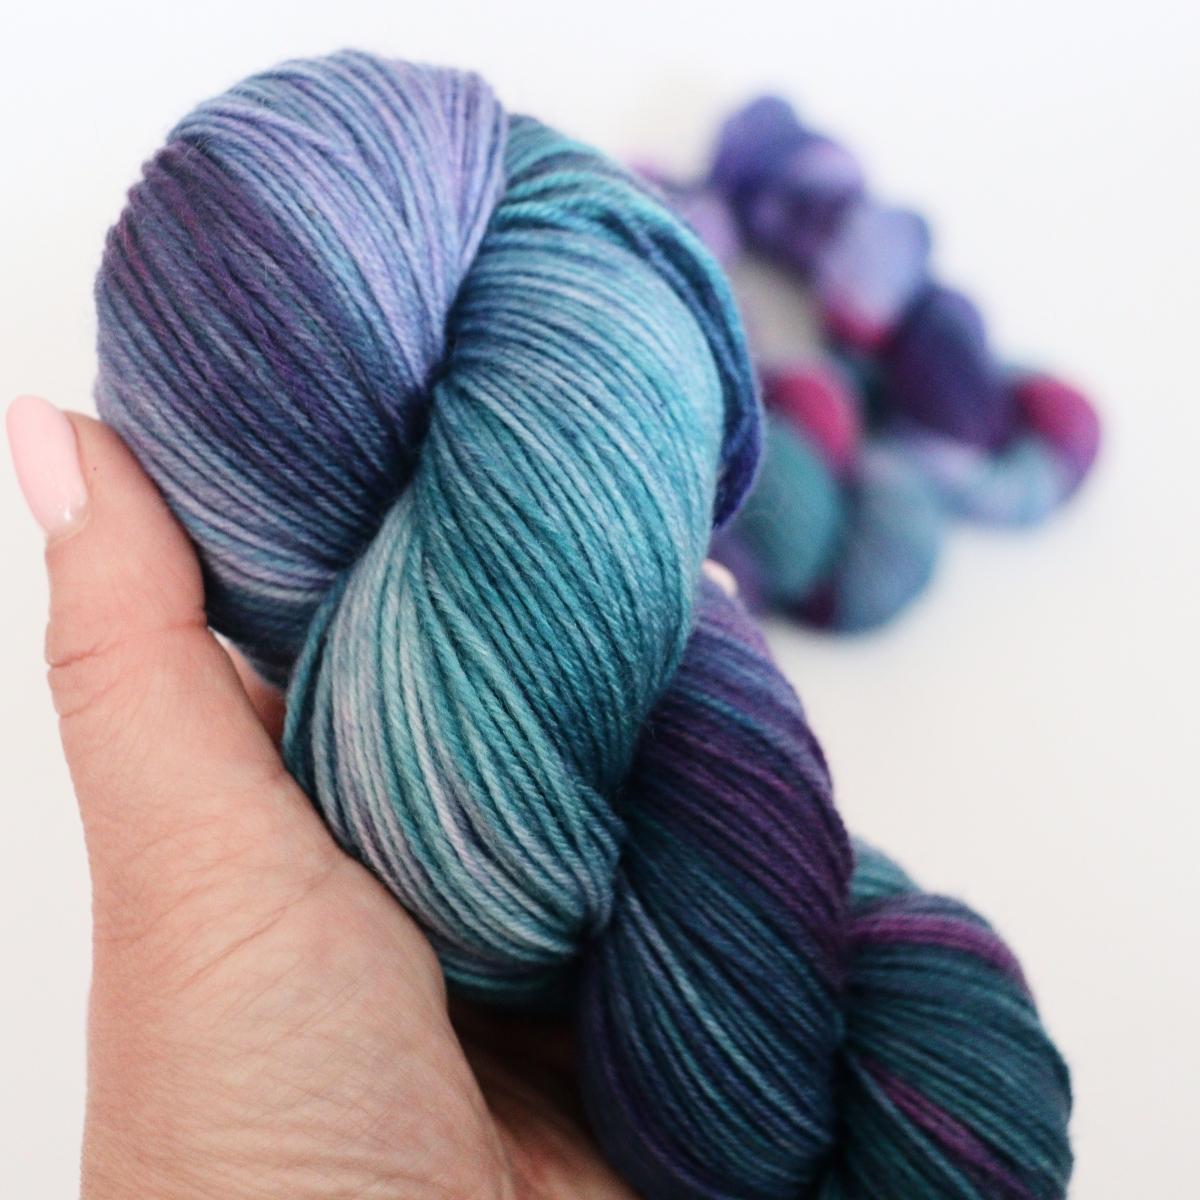 woodico.pro hand dyed yarn 064 1 1200x1200 - Hand dyed yarn / 064